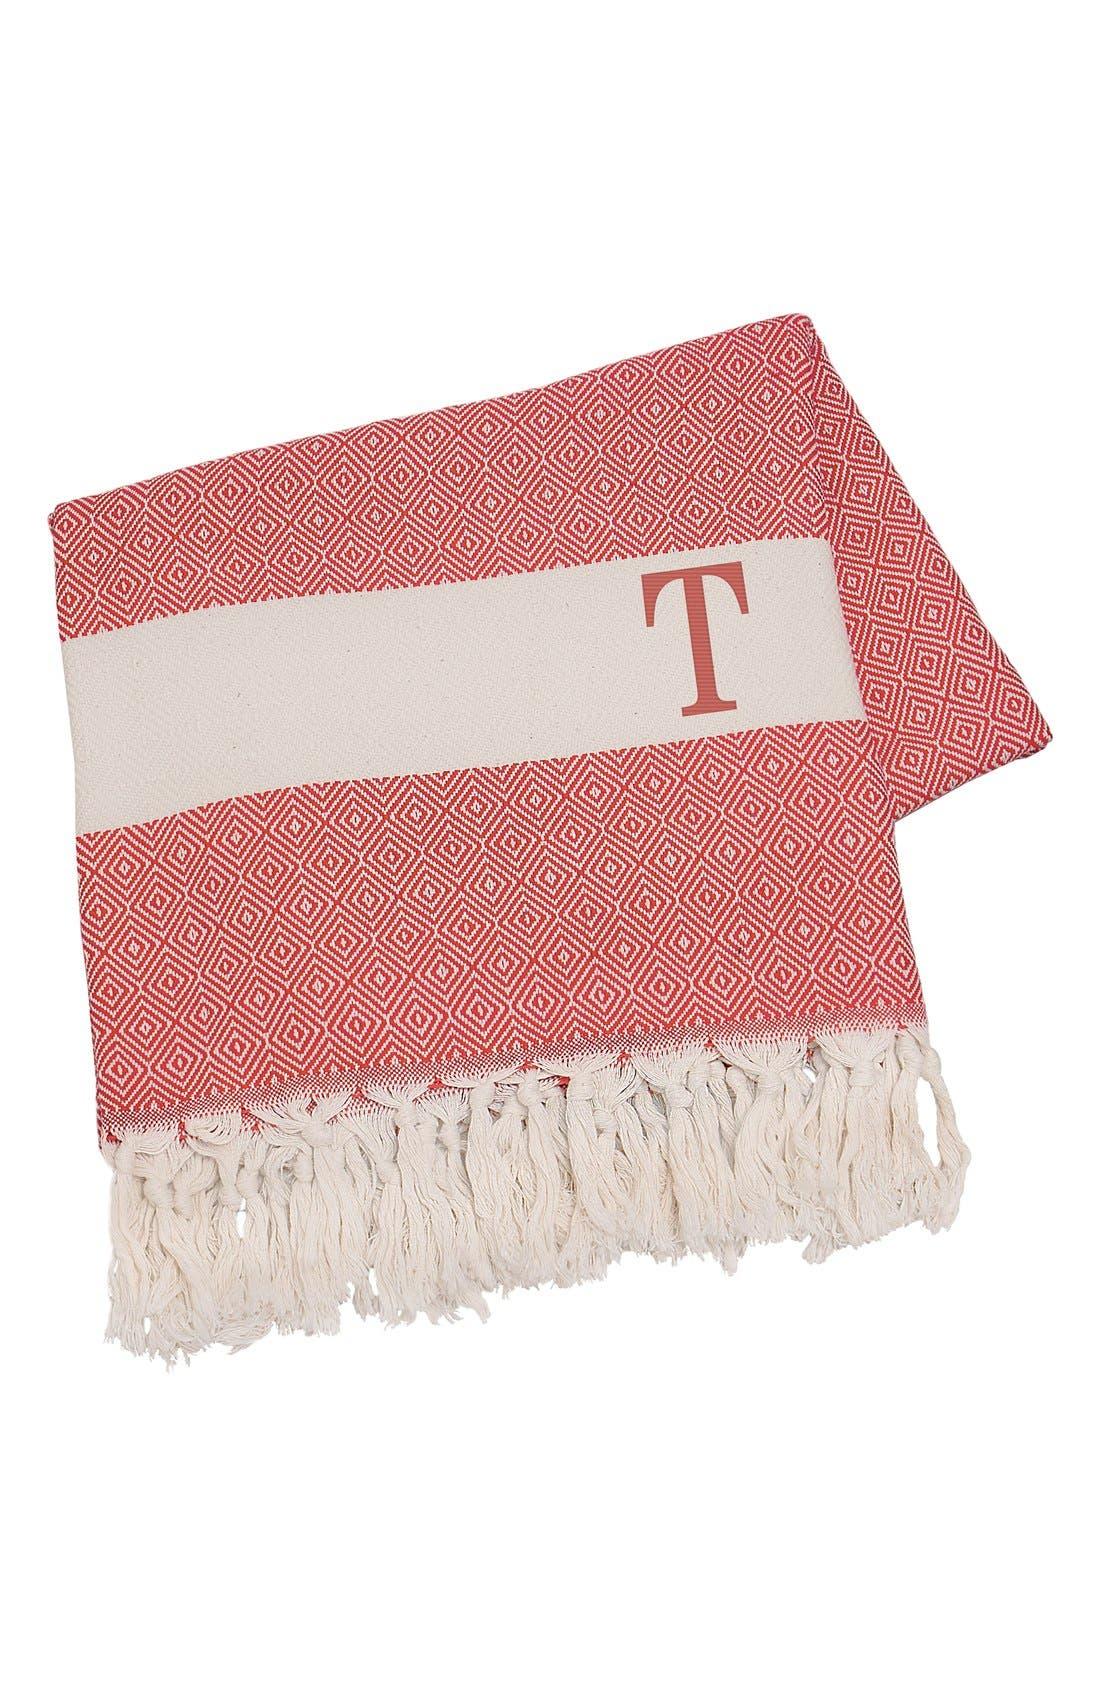 Monogram Turkish Cotton Throw,                             Main thumbnail 102, color,